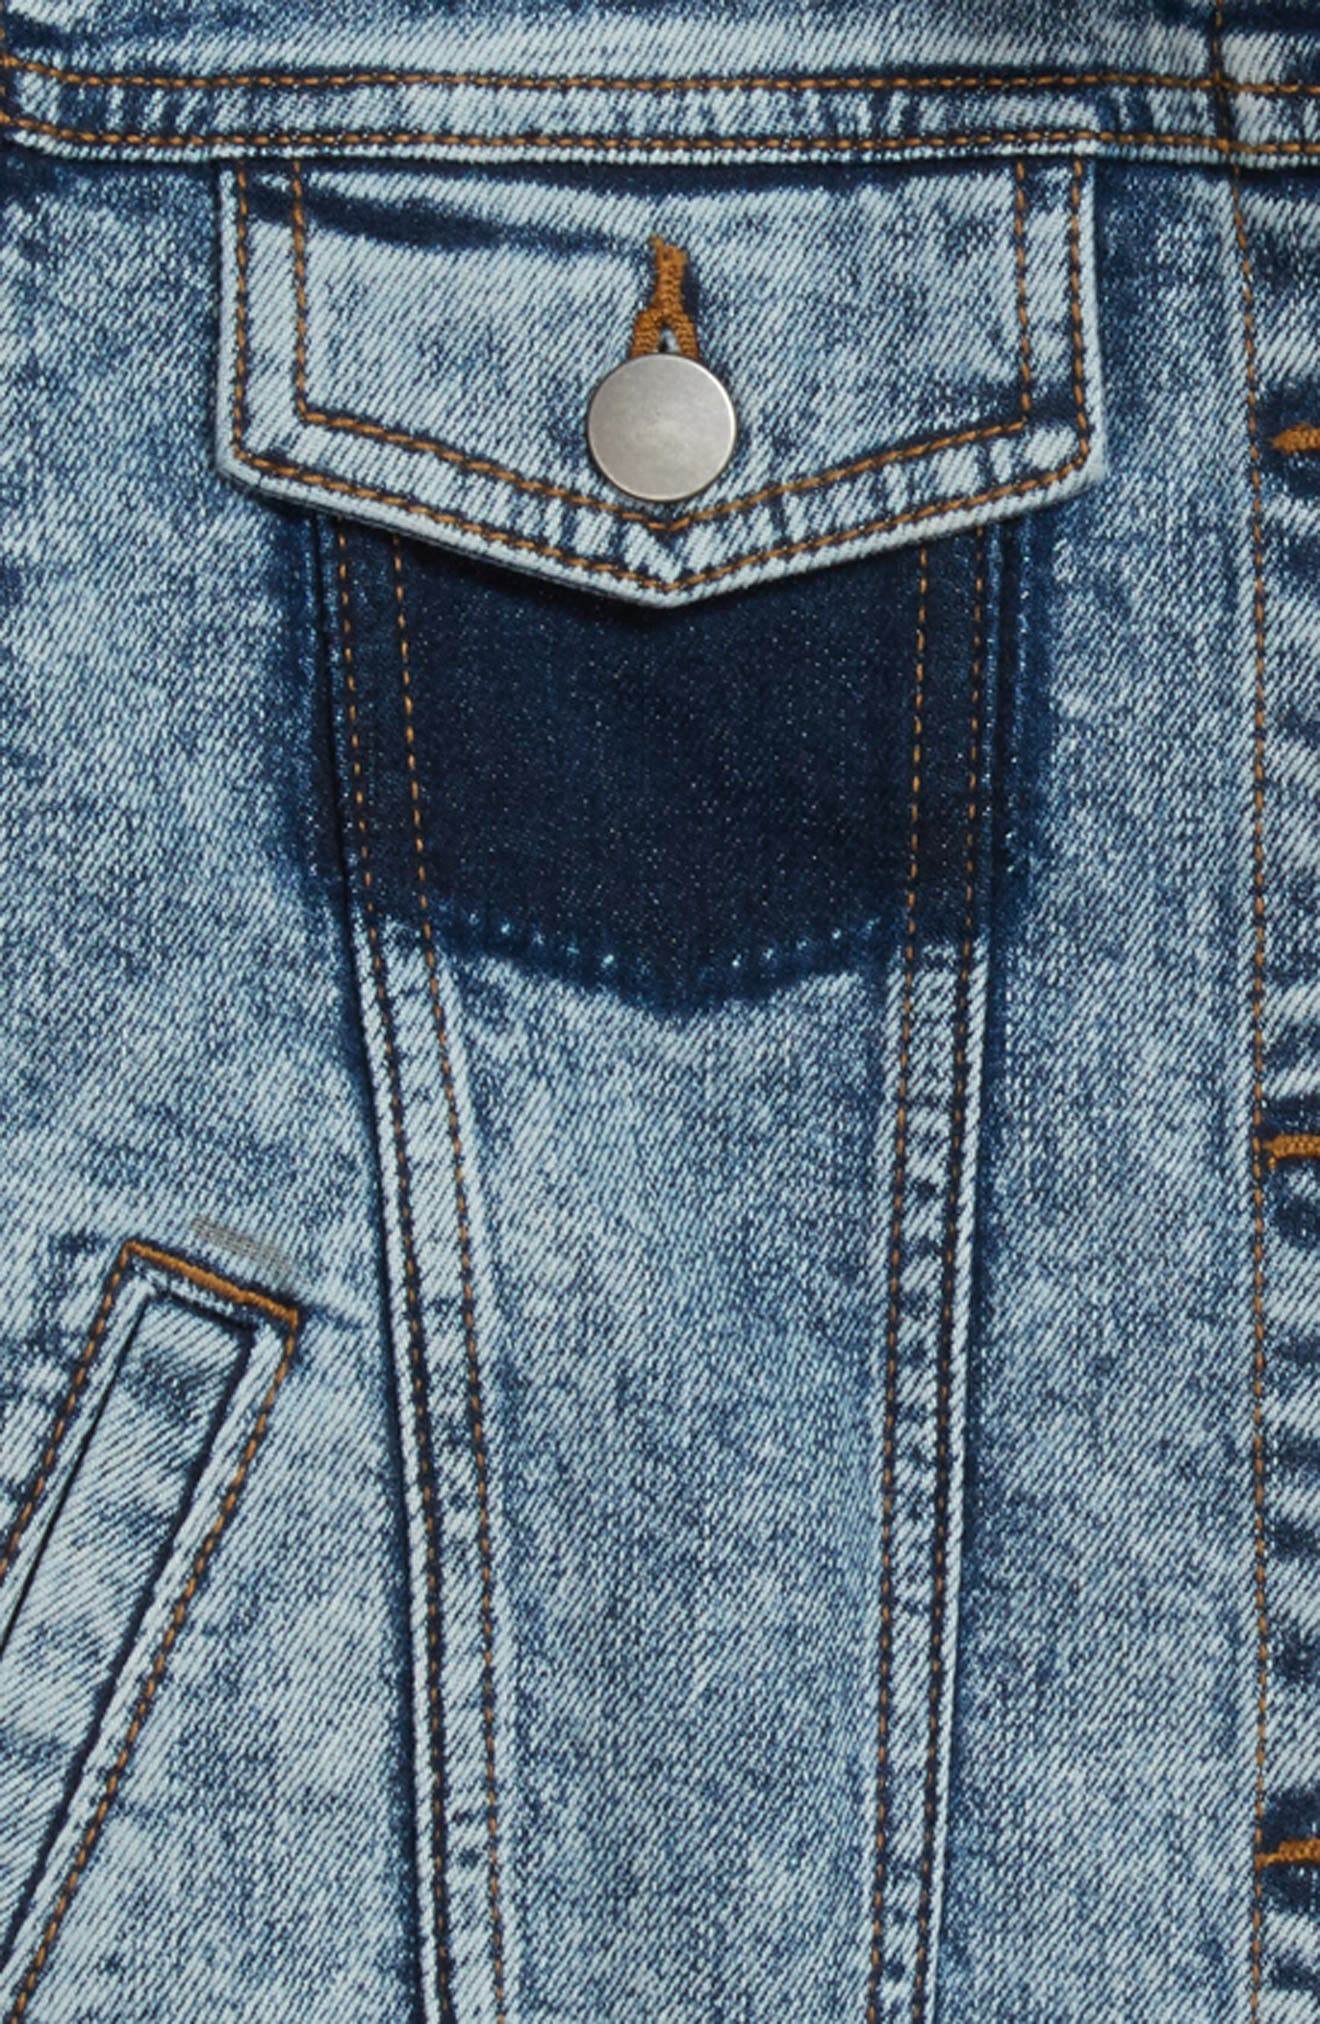 Embroidered Crop Denim Jacket,                             Alternate thumbnail 3, color,                             Stone Cold Wash